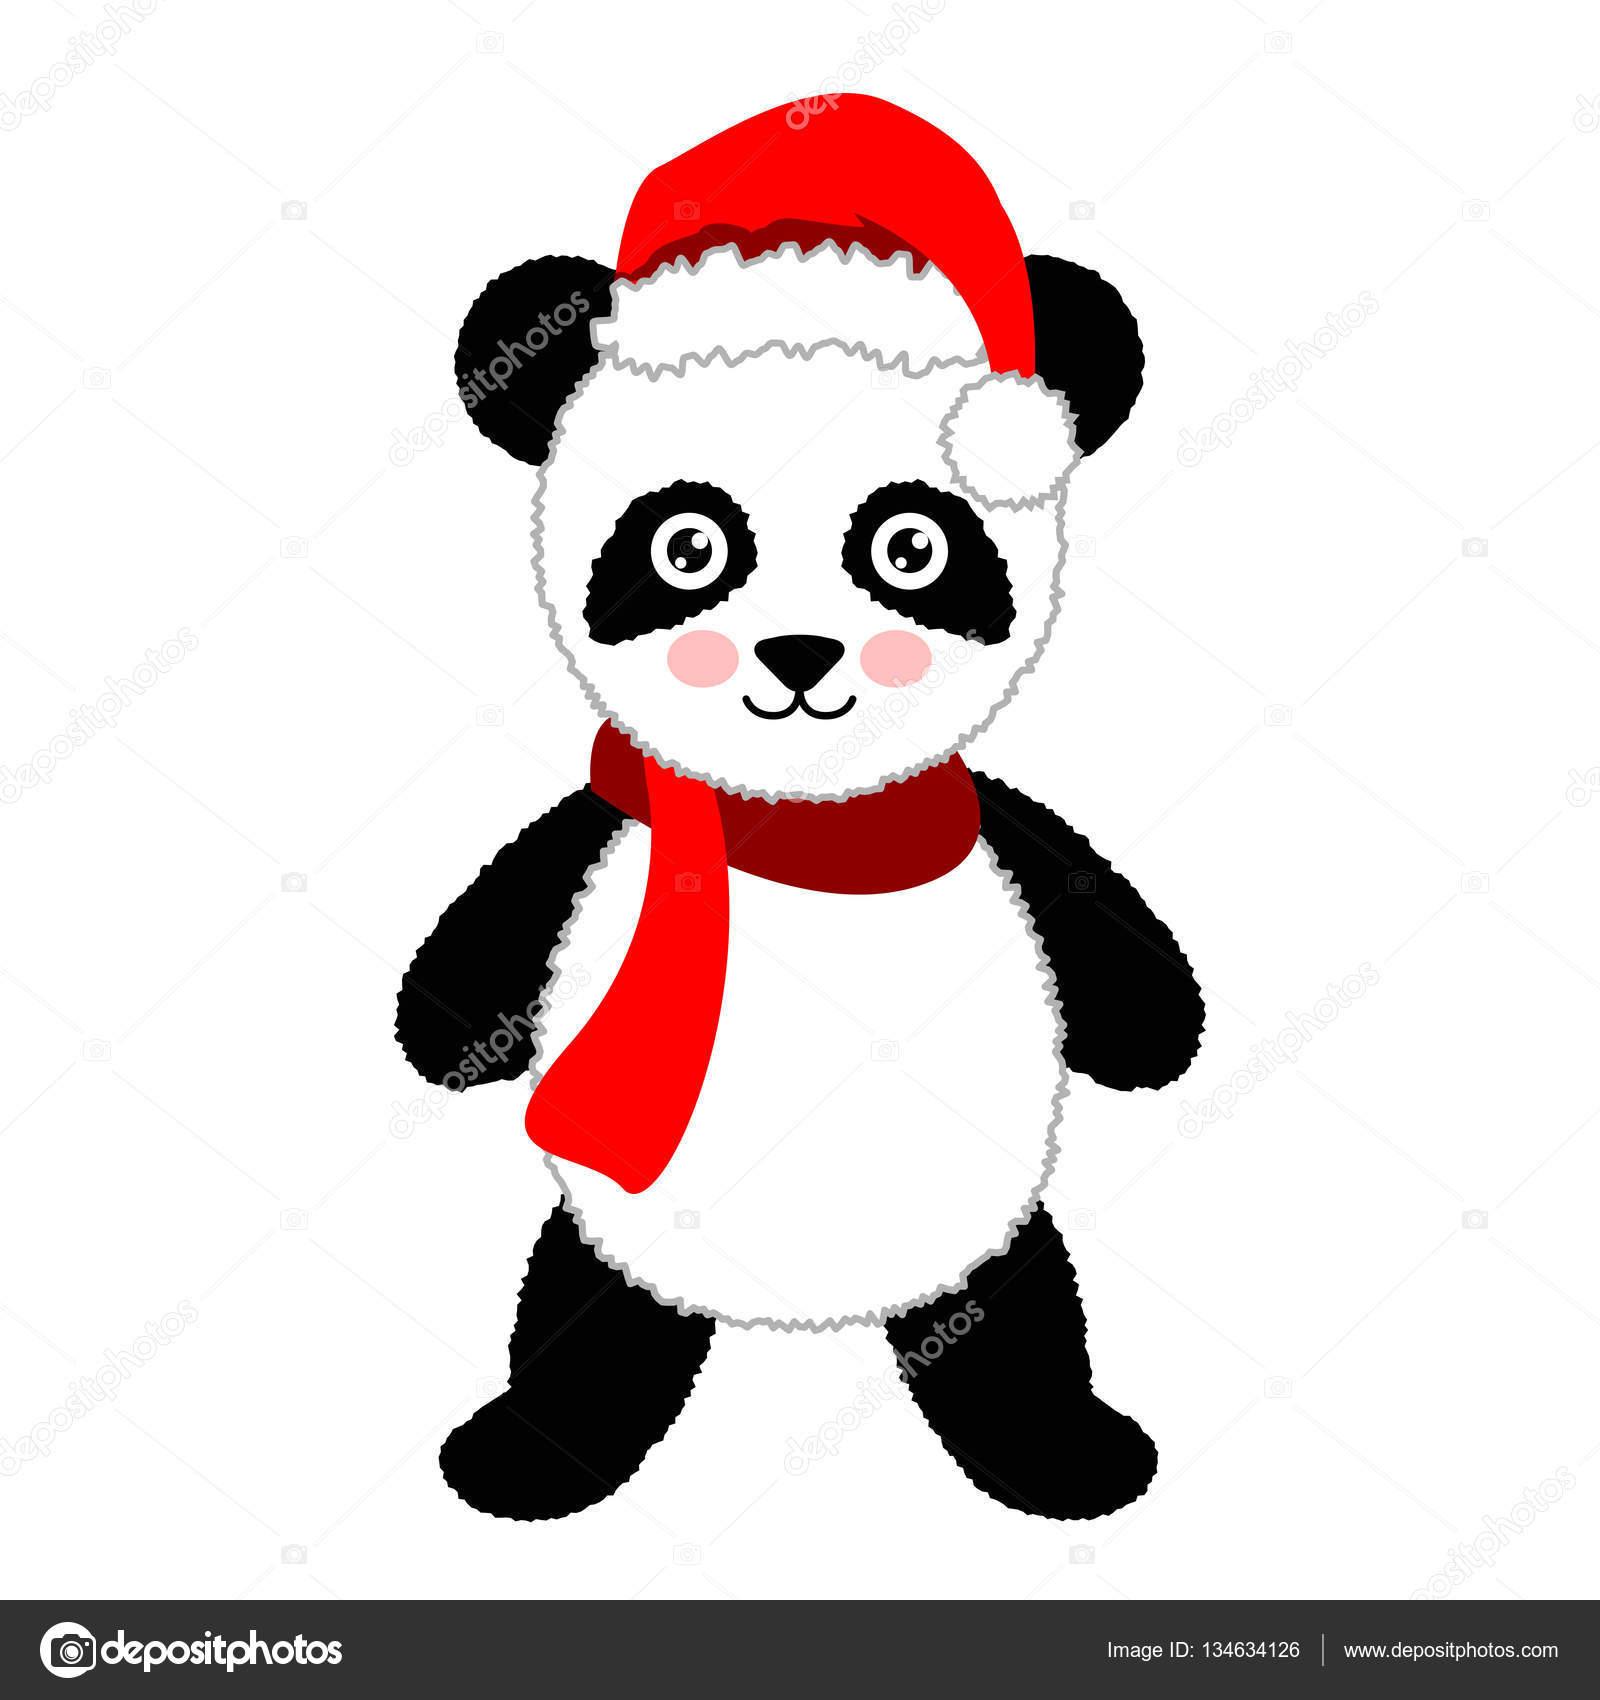 Image bonnet de noel dessin - Dessins de panda ...